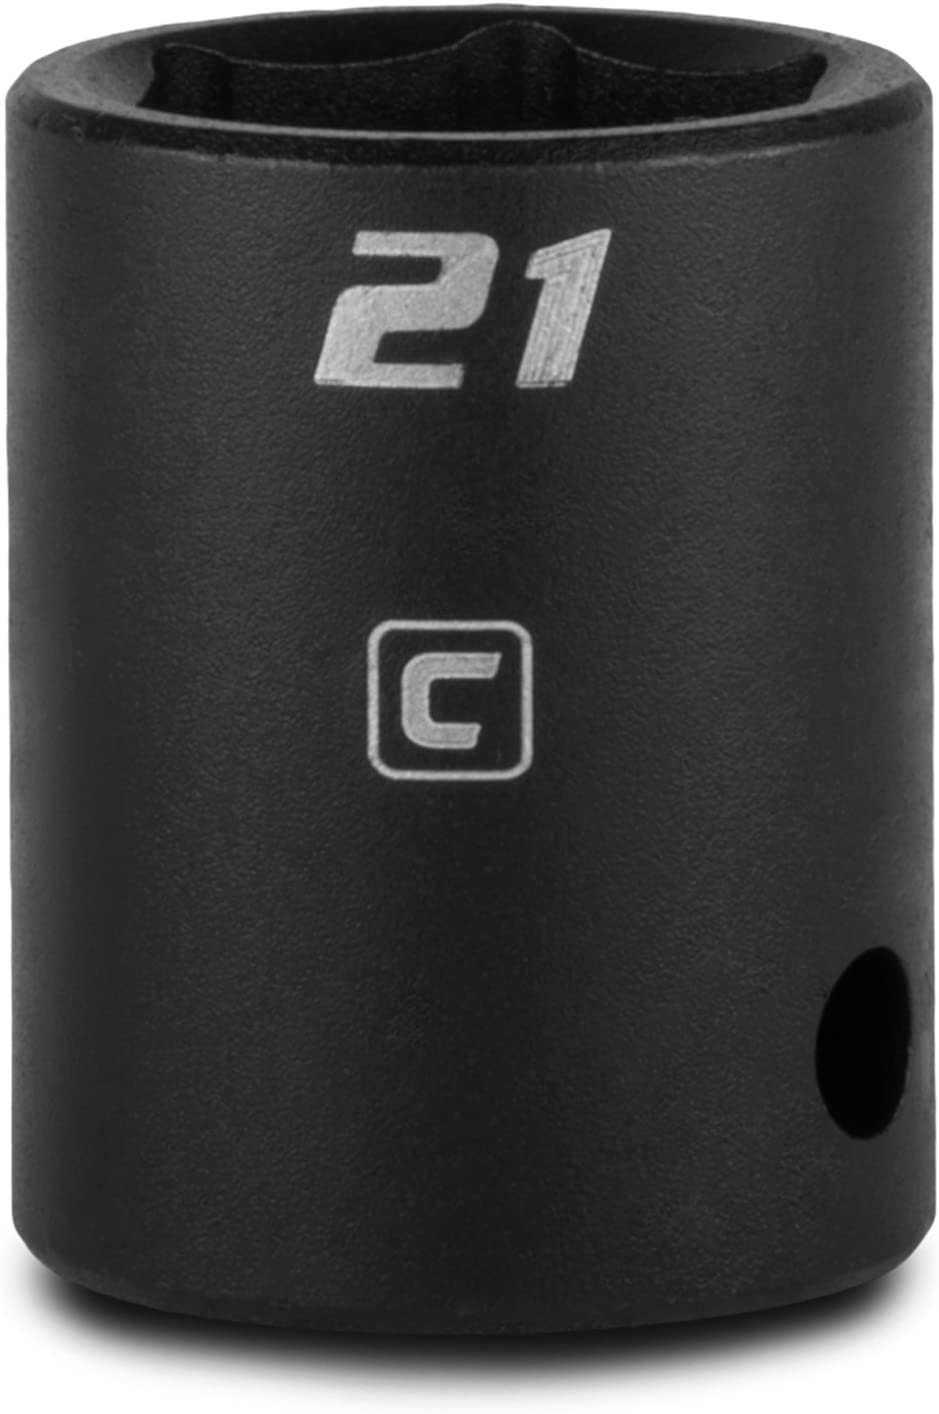 Capri Tools Shallow Impact Socket 6-Point 1//2-Inch Drive Metric 23 mm